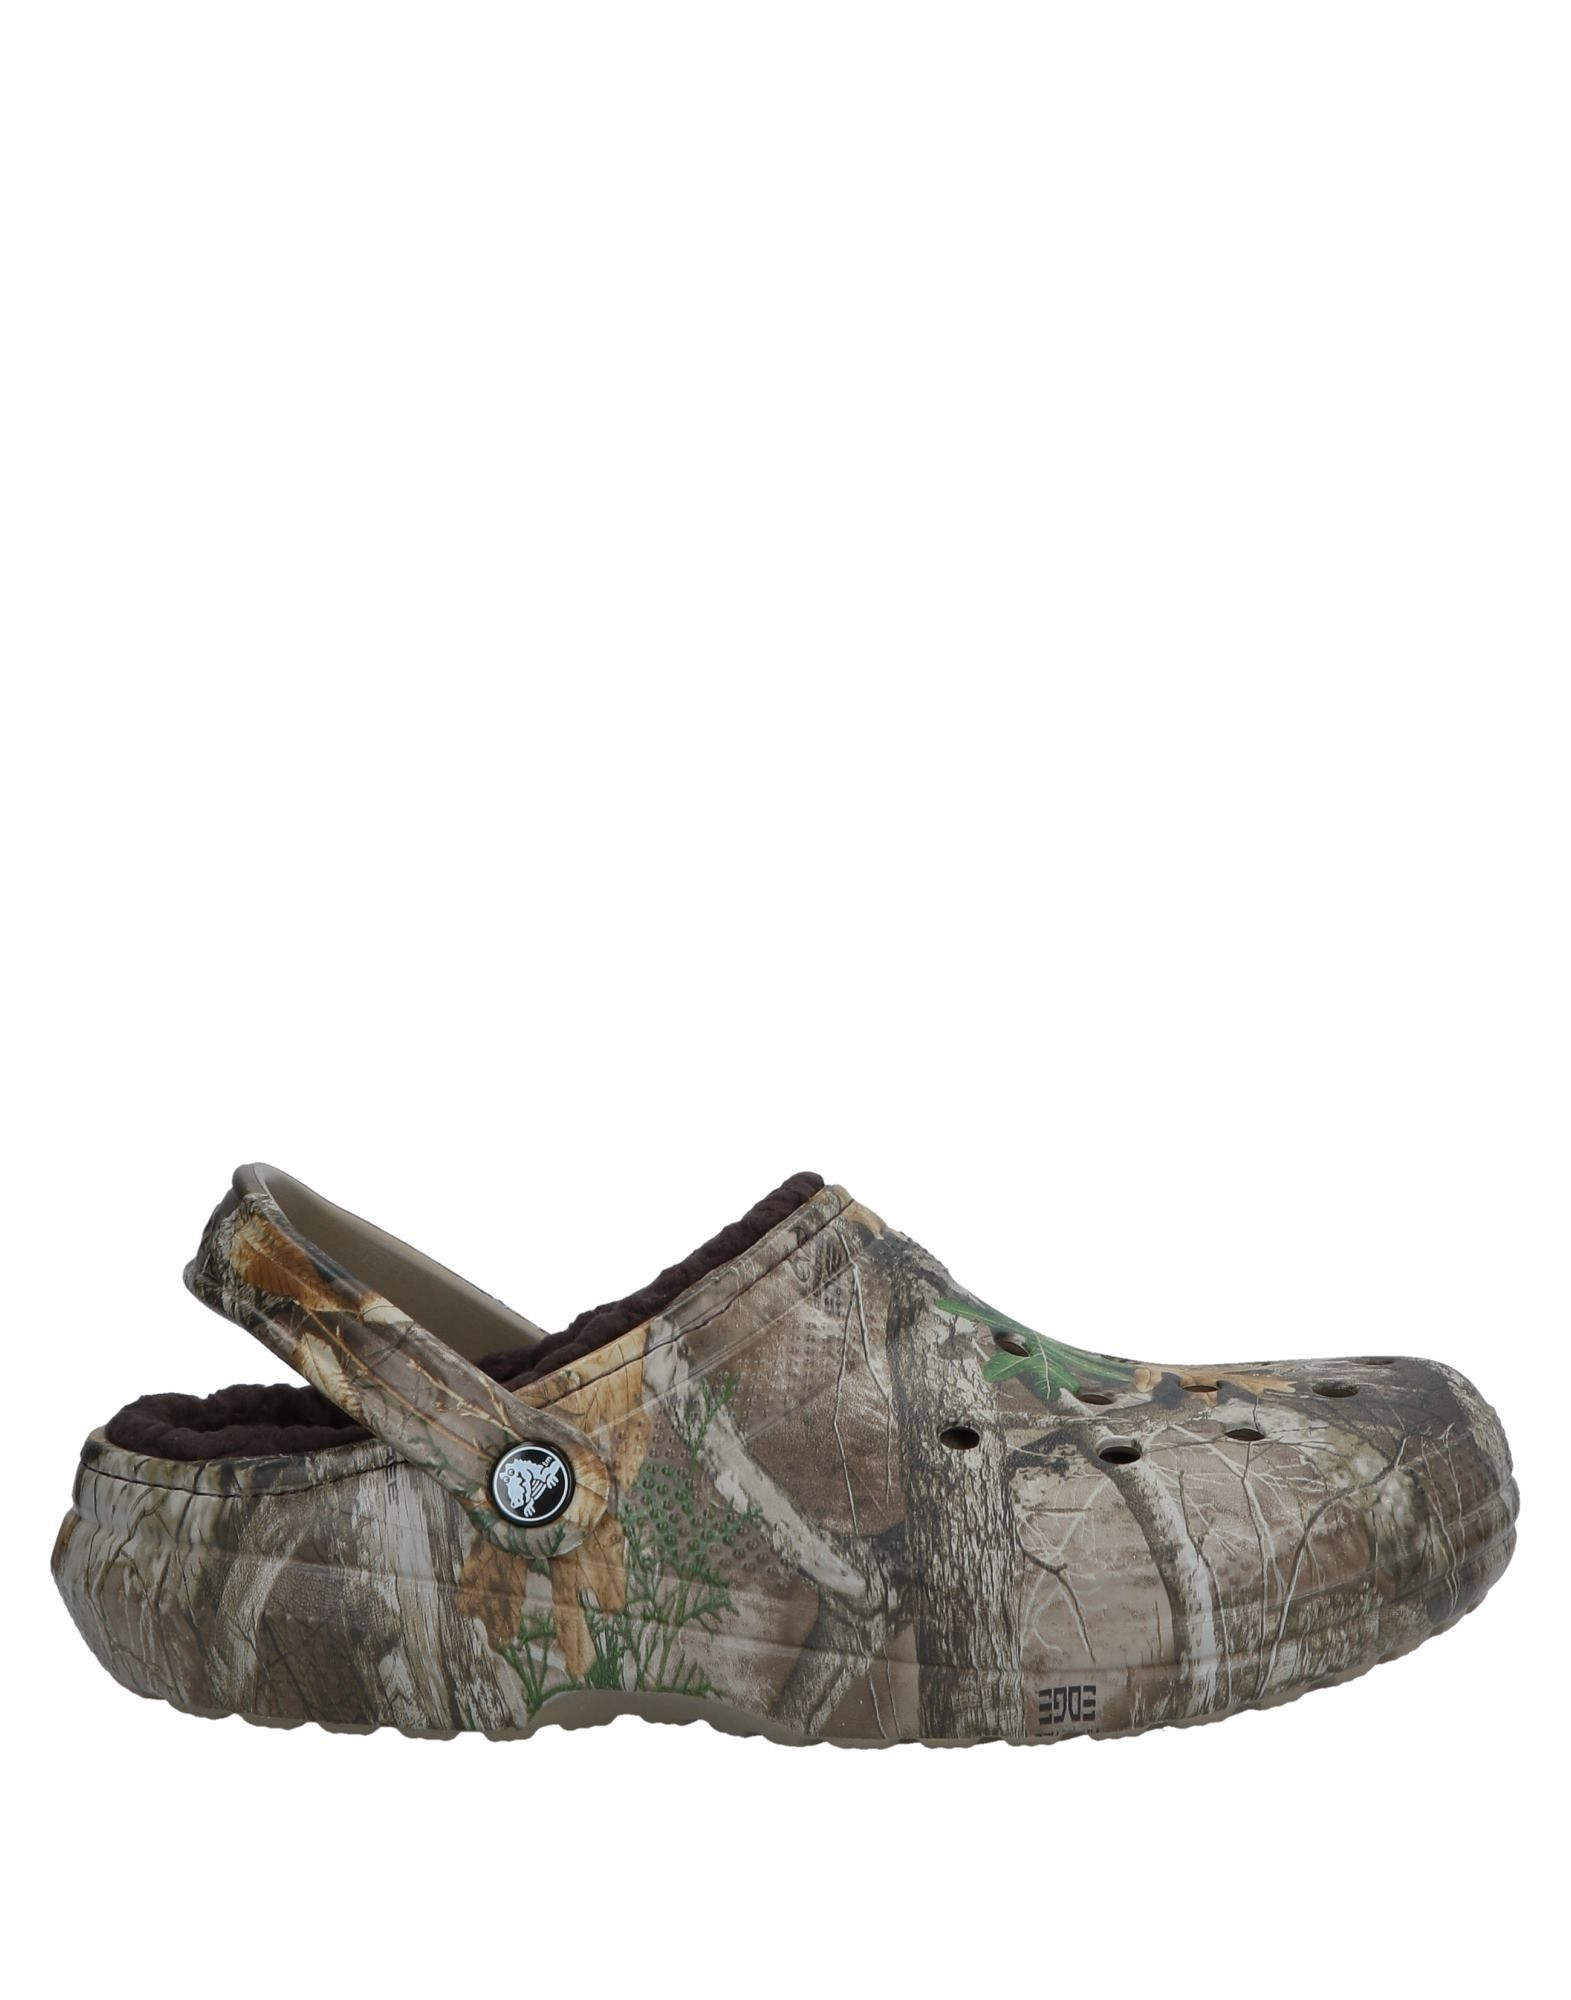 Rabatt Schuhe echte Schuhe Rabatt Crocs Sandalen Herren 11571597JB 44dfdf